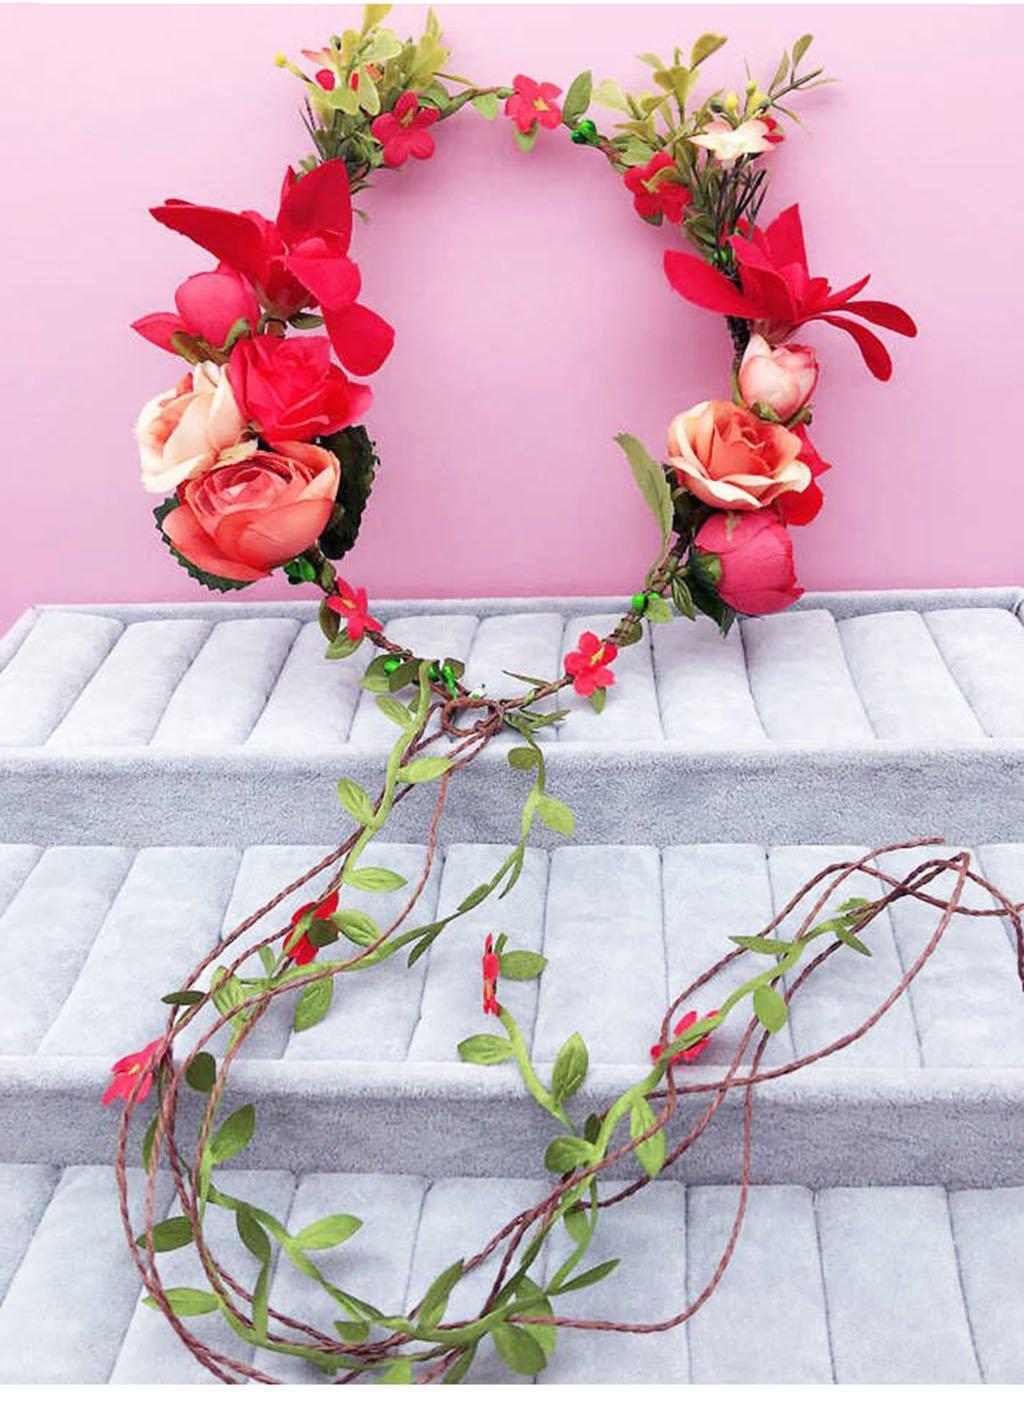 Wreath Flower, Headband Flower Garland Handmade Wedding Bride Party Ribbon Headband Wristband Hairband Red (Color : A)